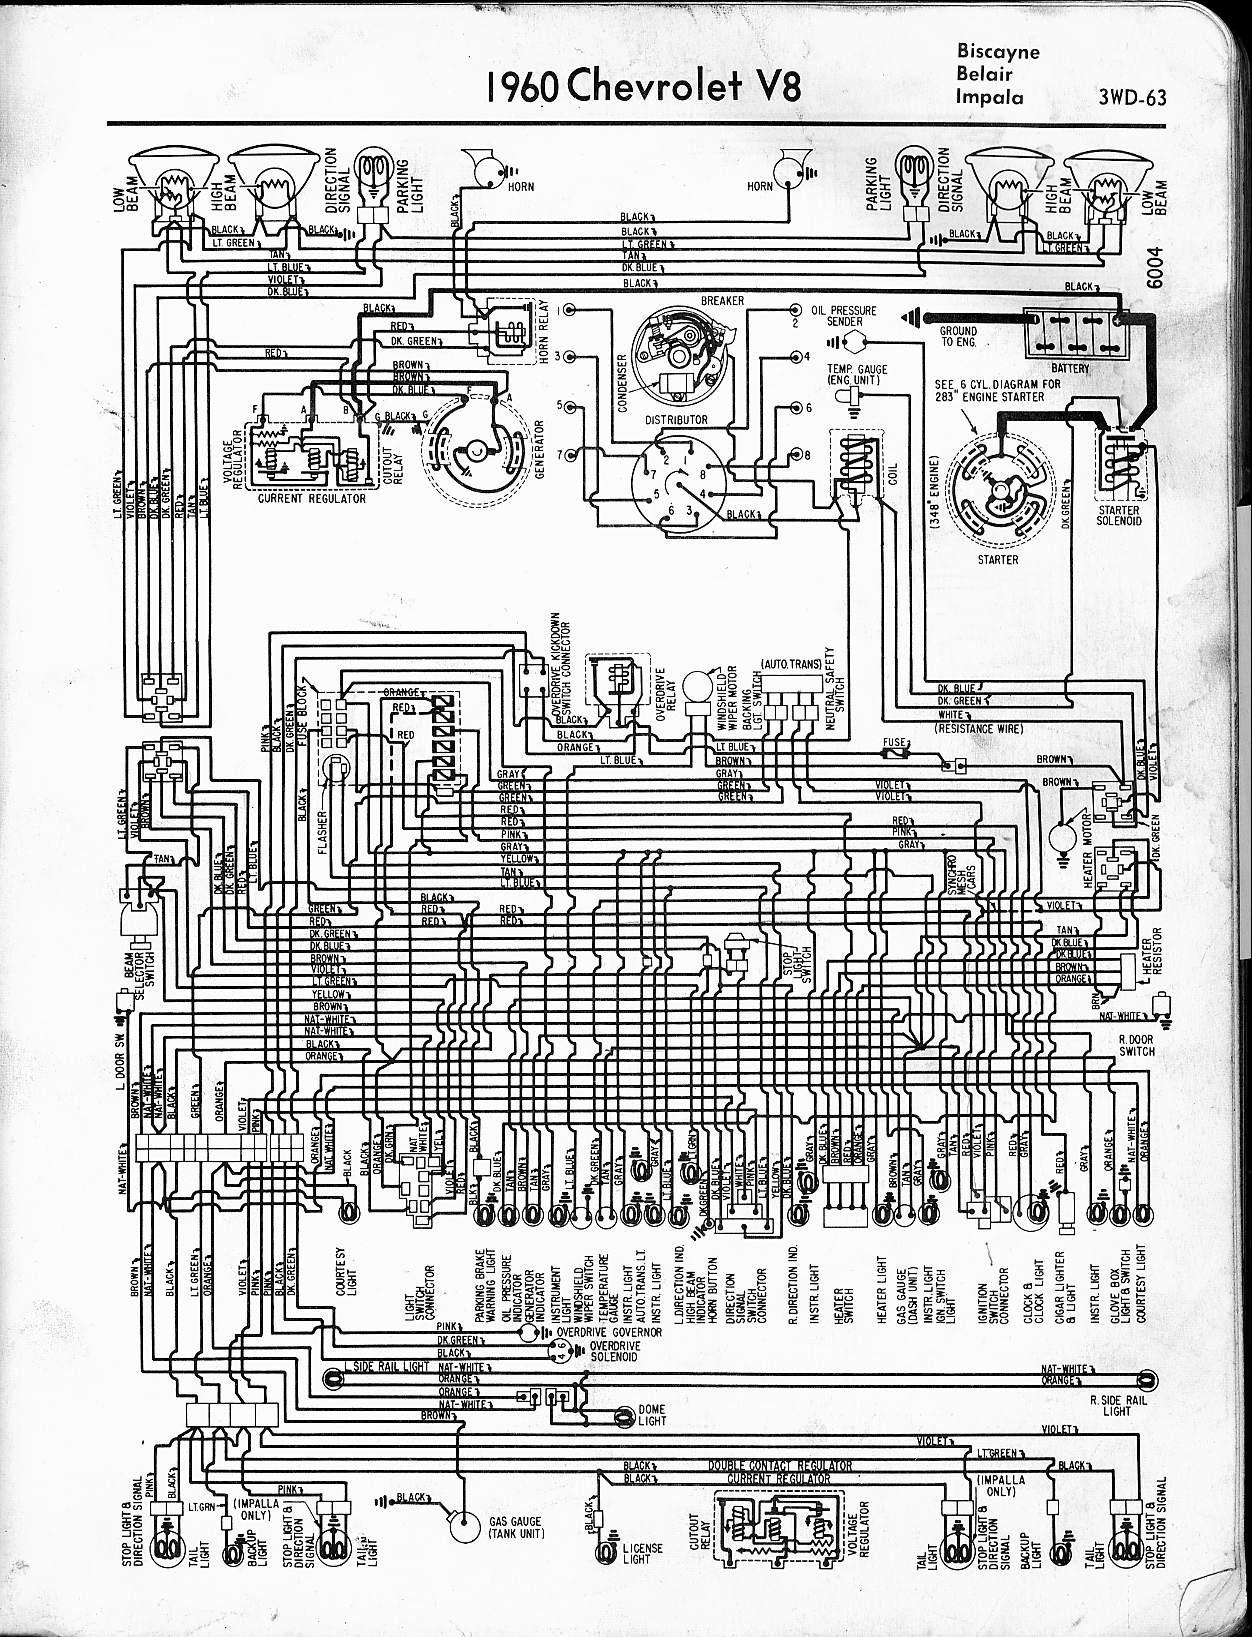 85 chevy truck wiring diagram 1960 chevrolet impala wiring diagram rh detoxicrecenze com Chevy 454 Starter Wiring Diagram 1970 GM Starter Wiring Diagram